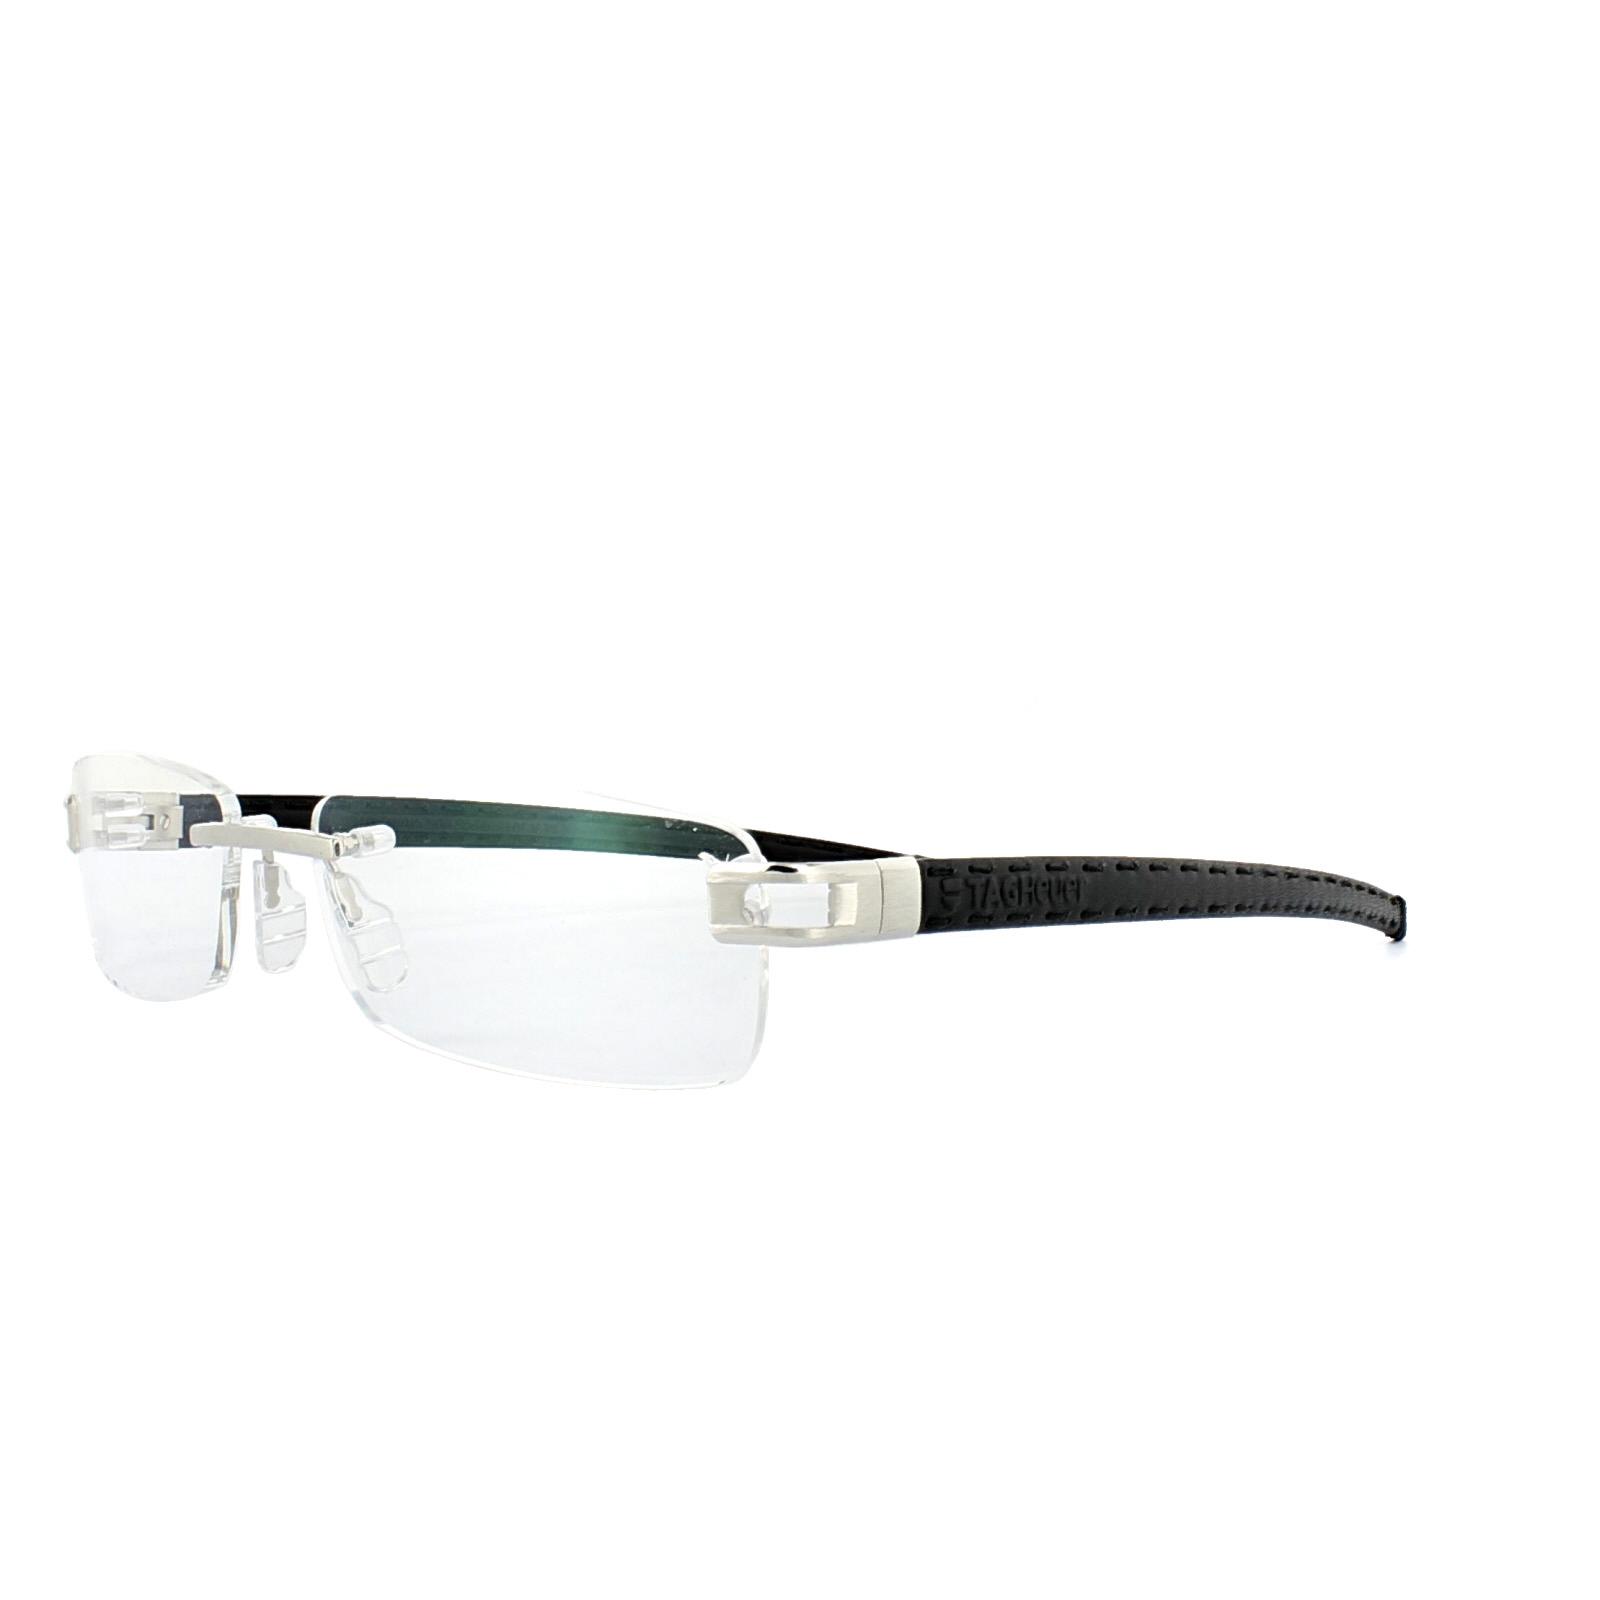 Tag Heuer Glasses Frames L-Type T 0152 002 Platinum Black Leather ...